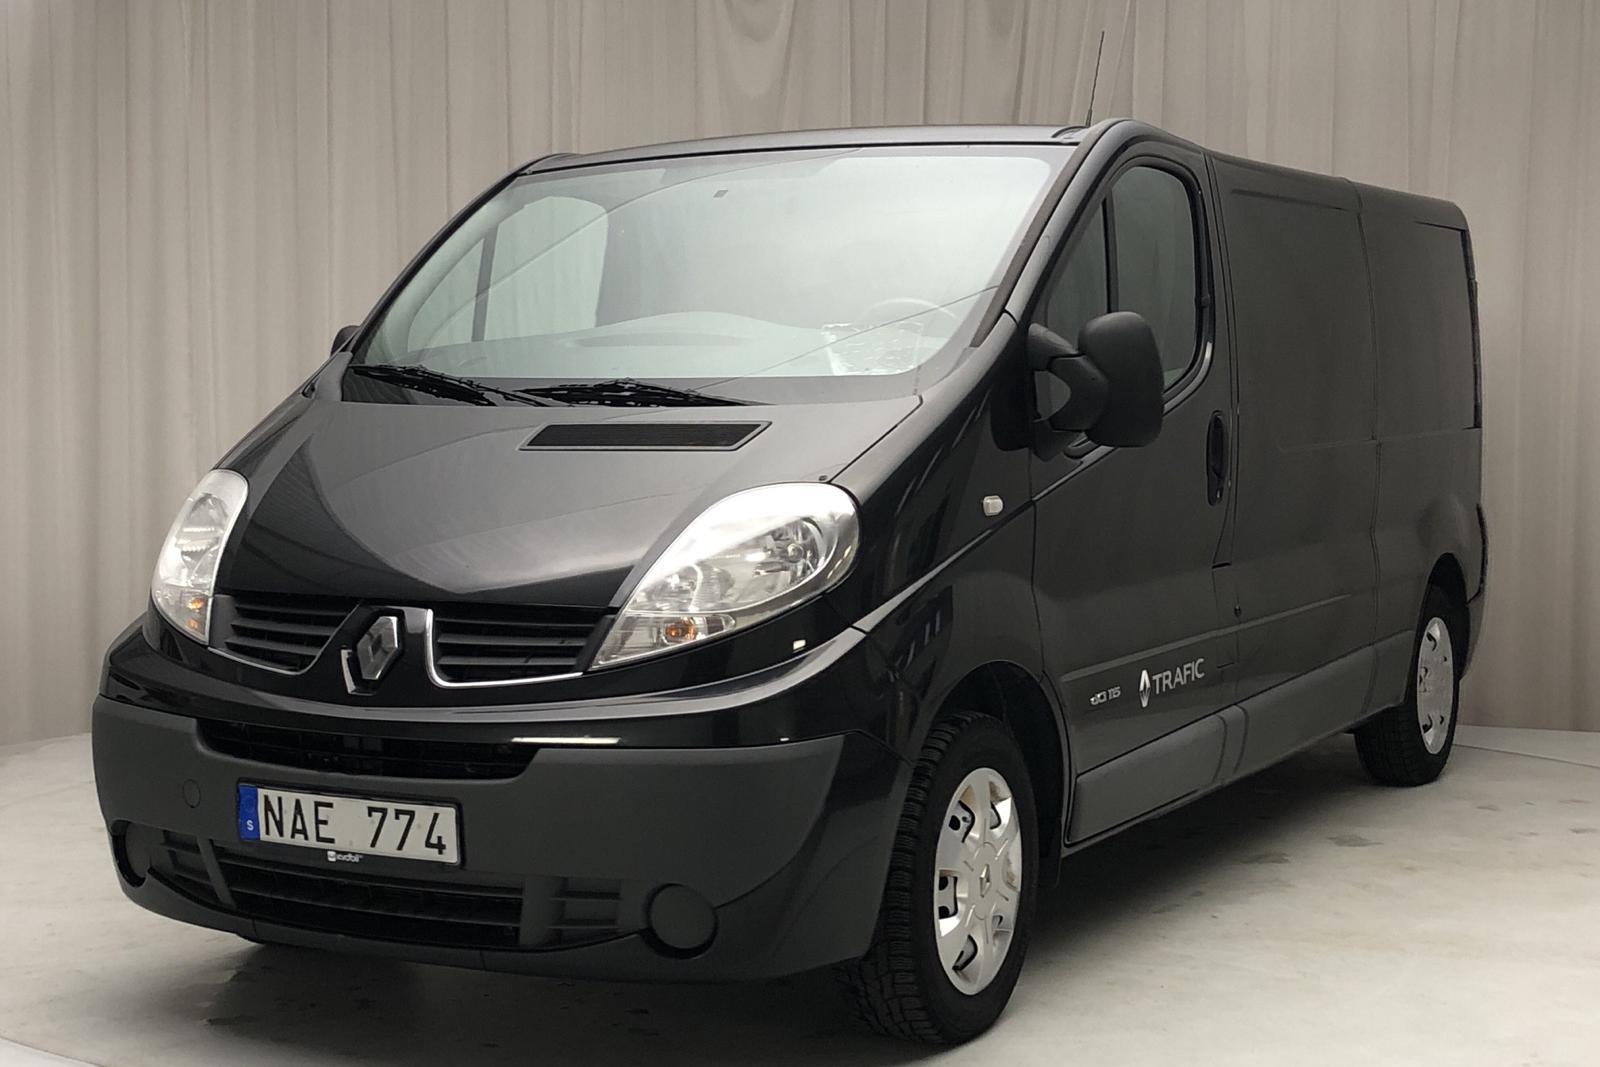 Renault Trafic 2.0 dCi Skåp/Buss (115hk) - 0 mil - Manuell - svart - 2013